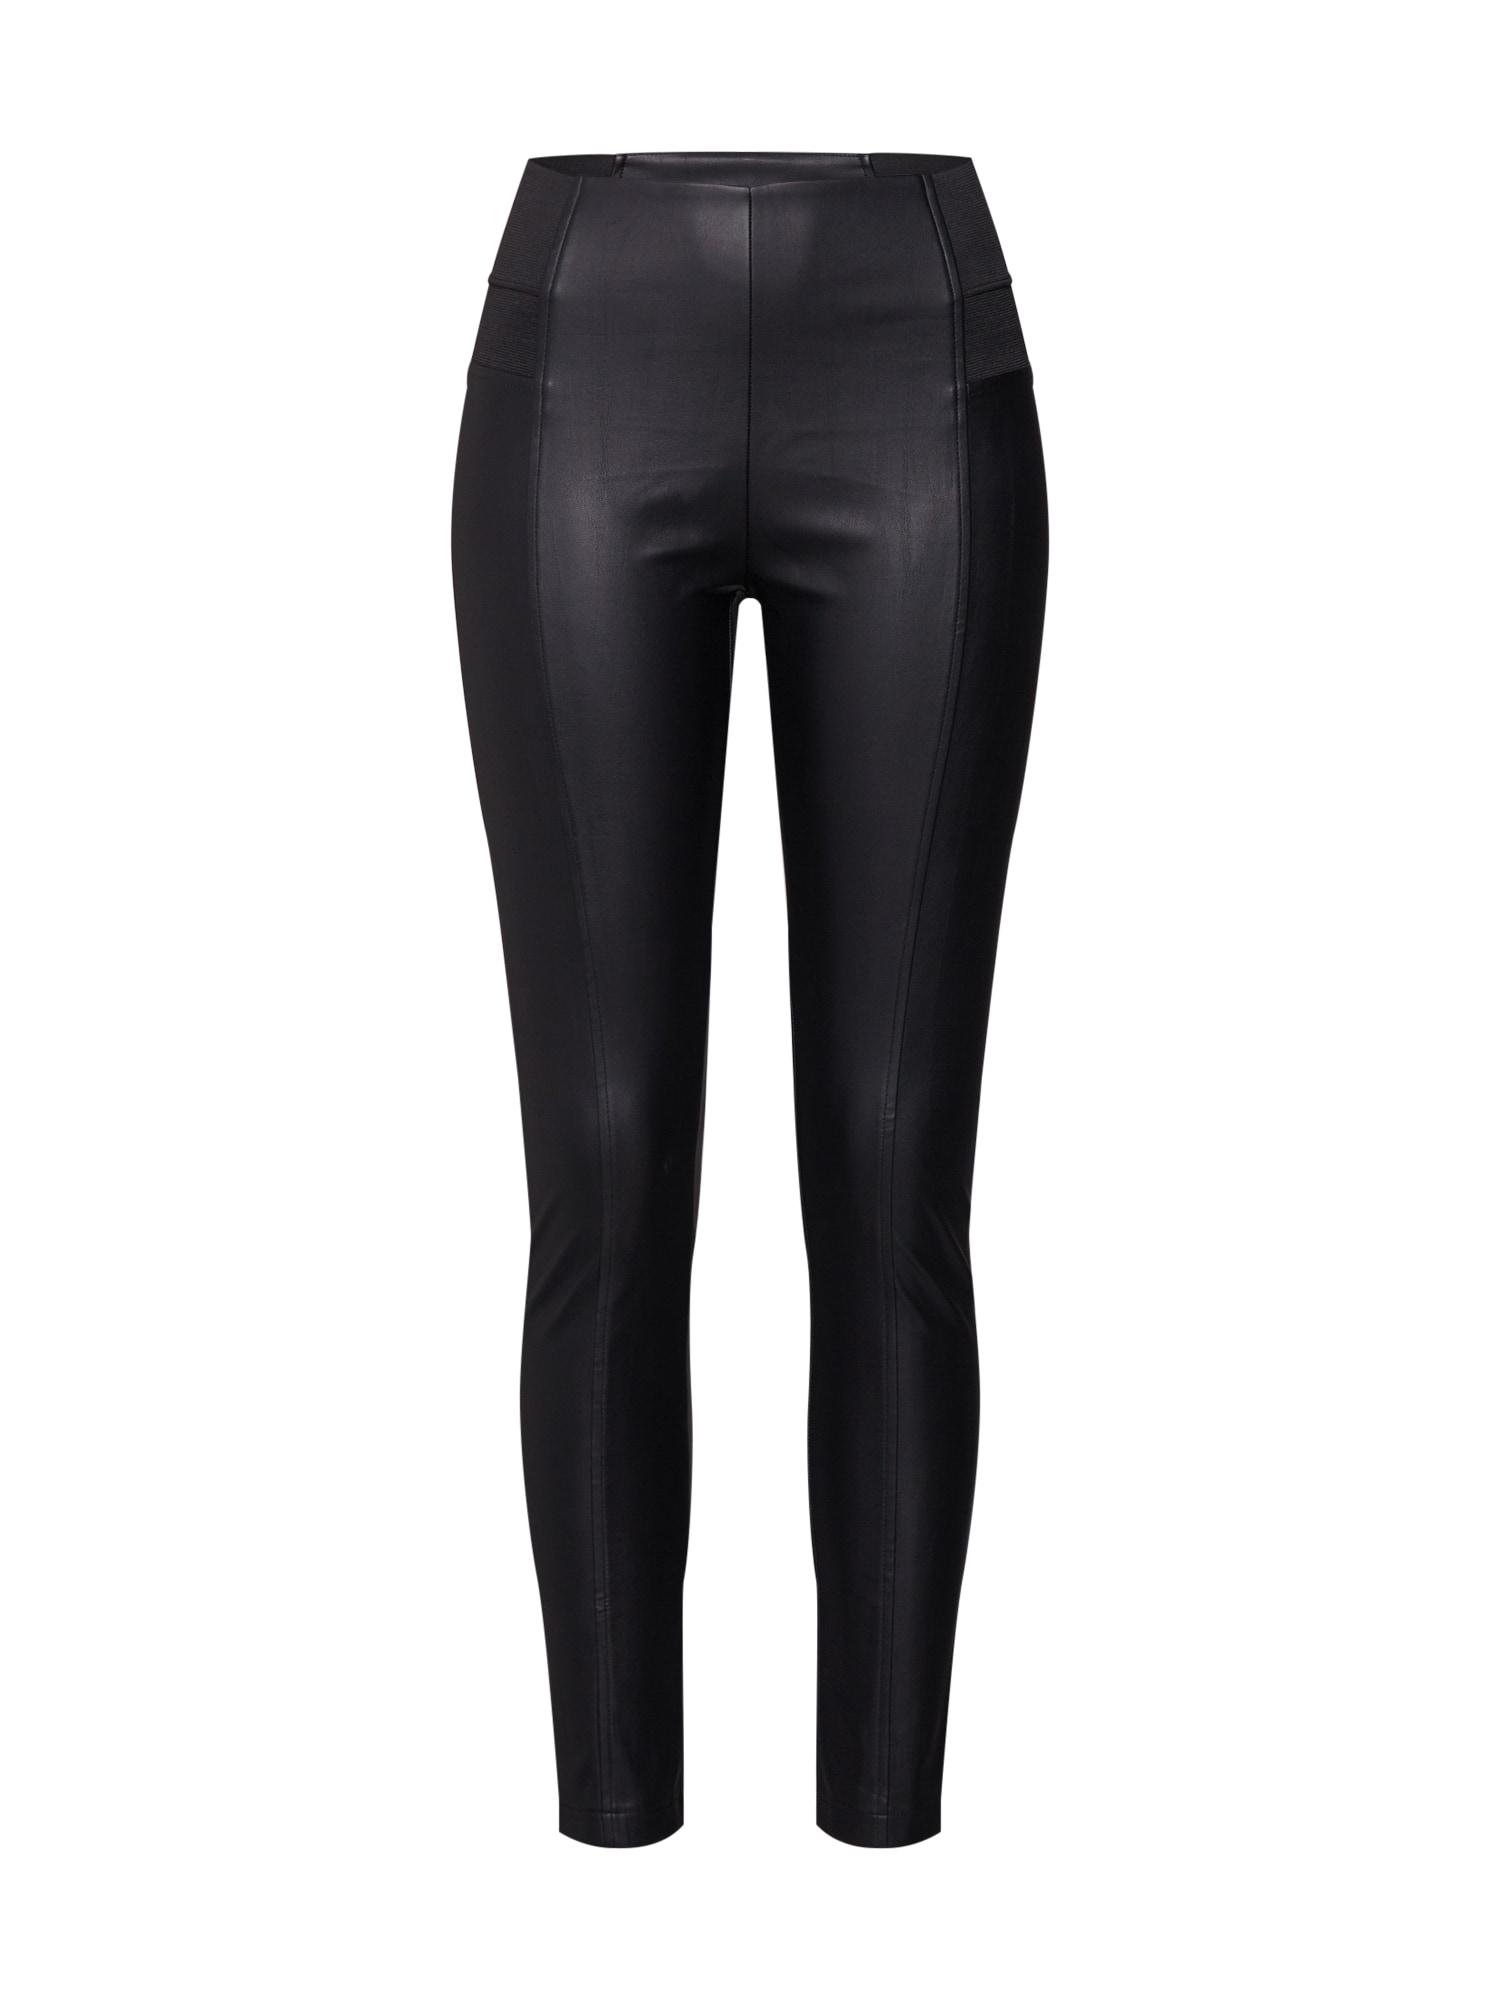 Lederimitathose | Bekleidung > Hosen > Lederhosen & Kunstlederhosen | Schwarz | GLAMOROUS